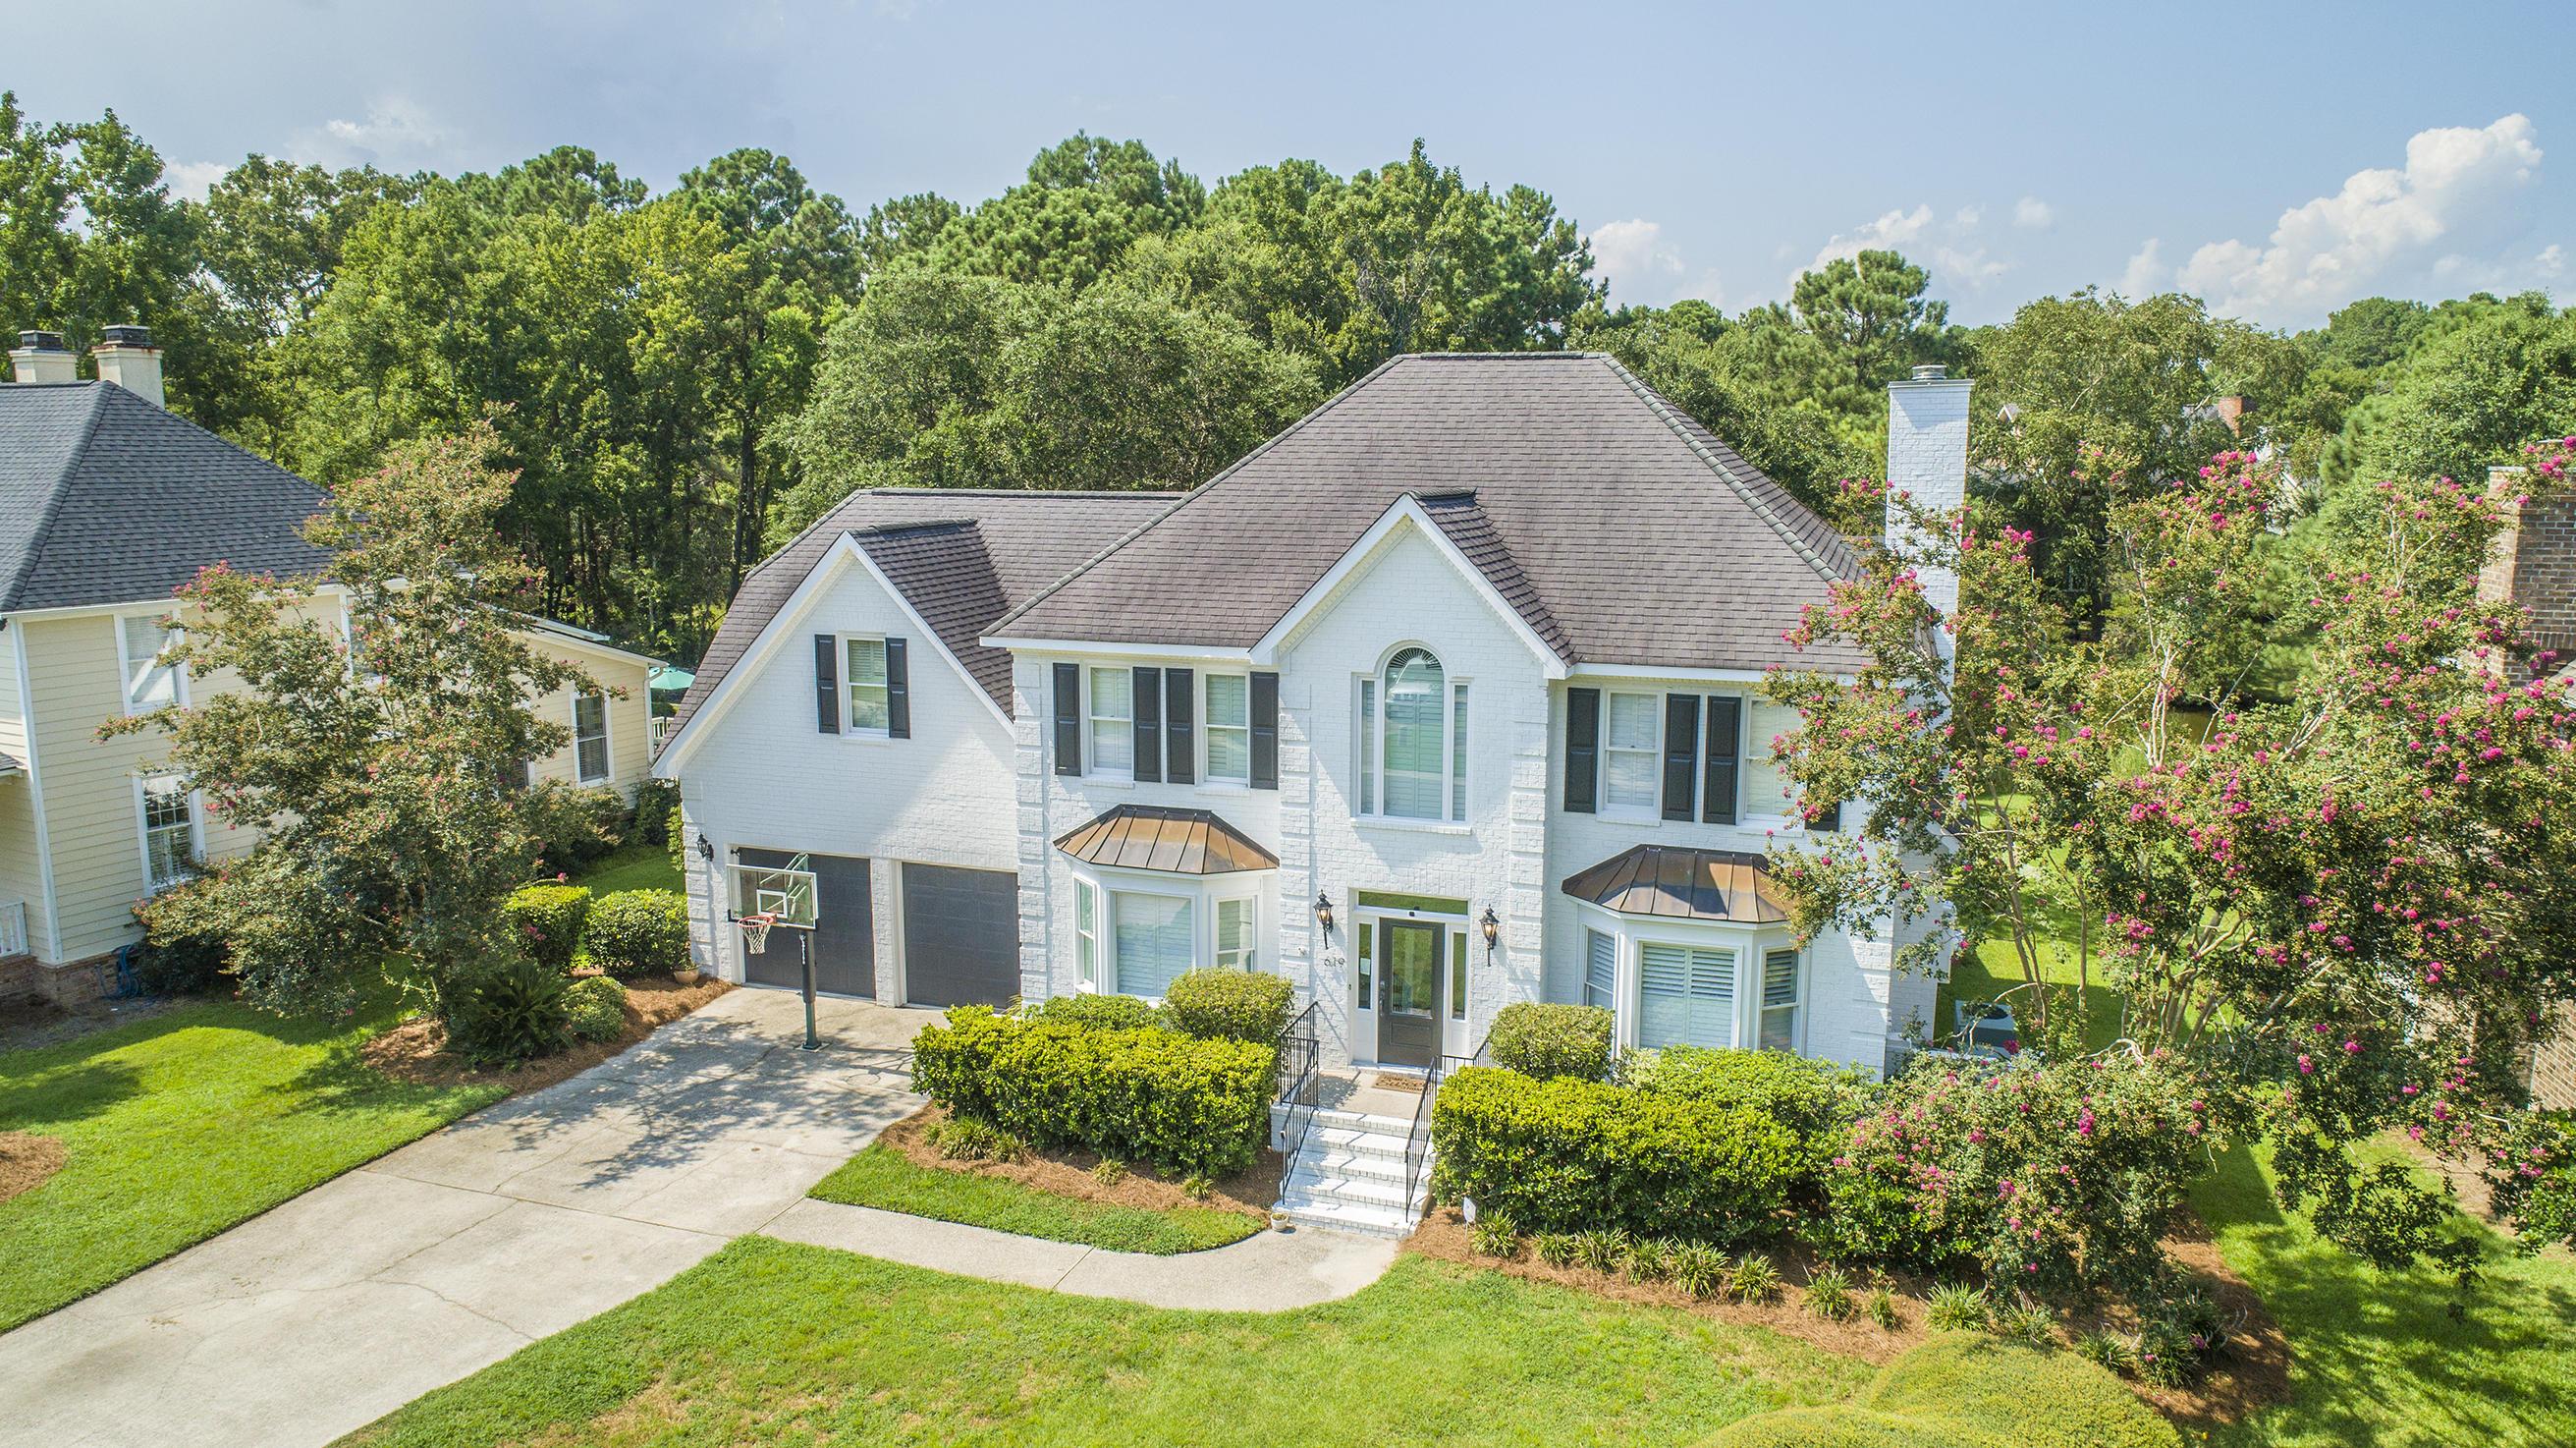 Hobcaw Creek Plantation Homes For Sale - 619 Palisades, Mount Pleasant, SC - 38